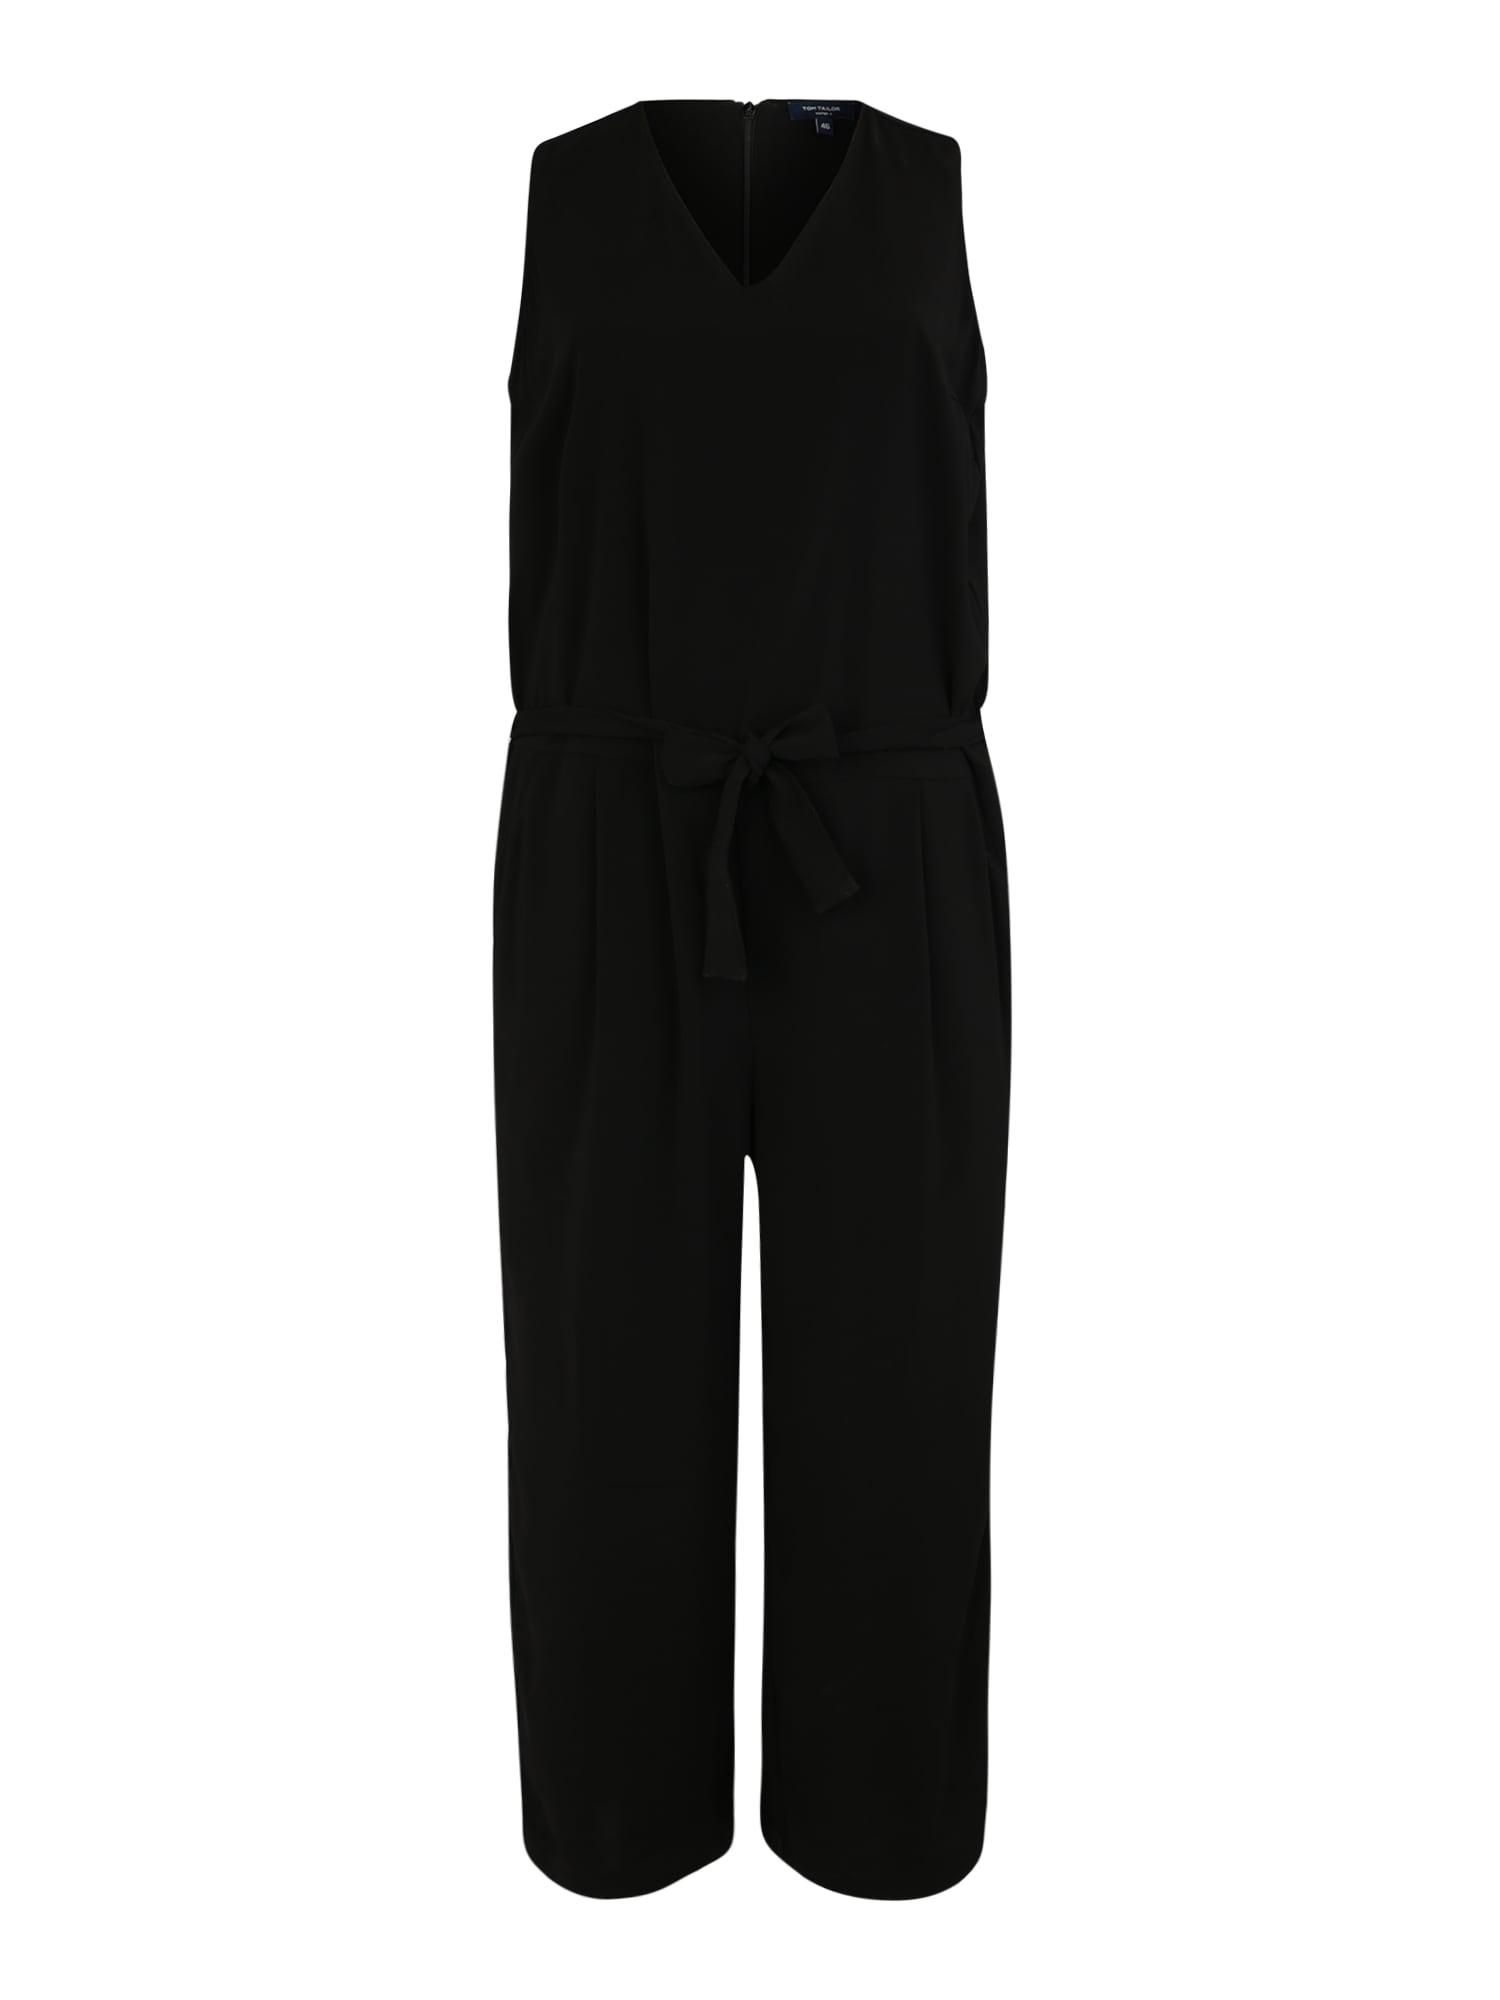 Tom Tailor Women + Kombinezono tipo kostiumas juoda